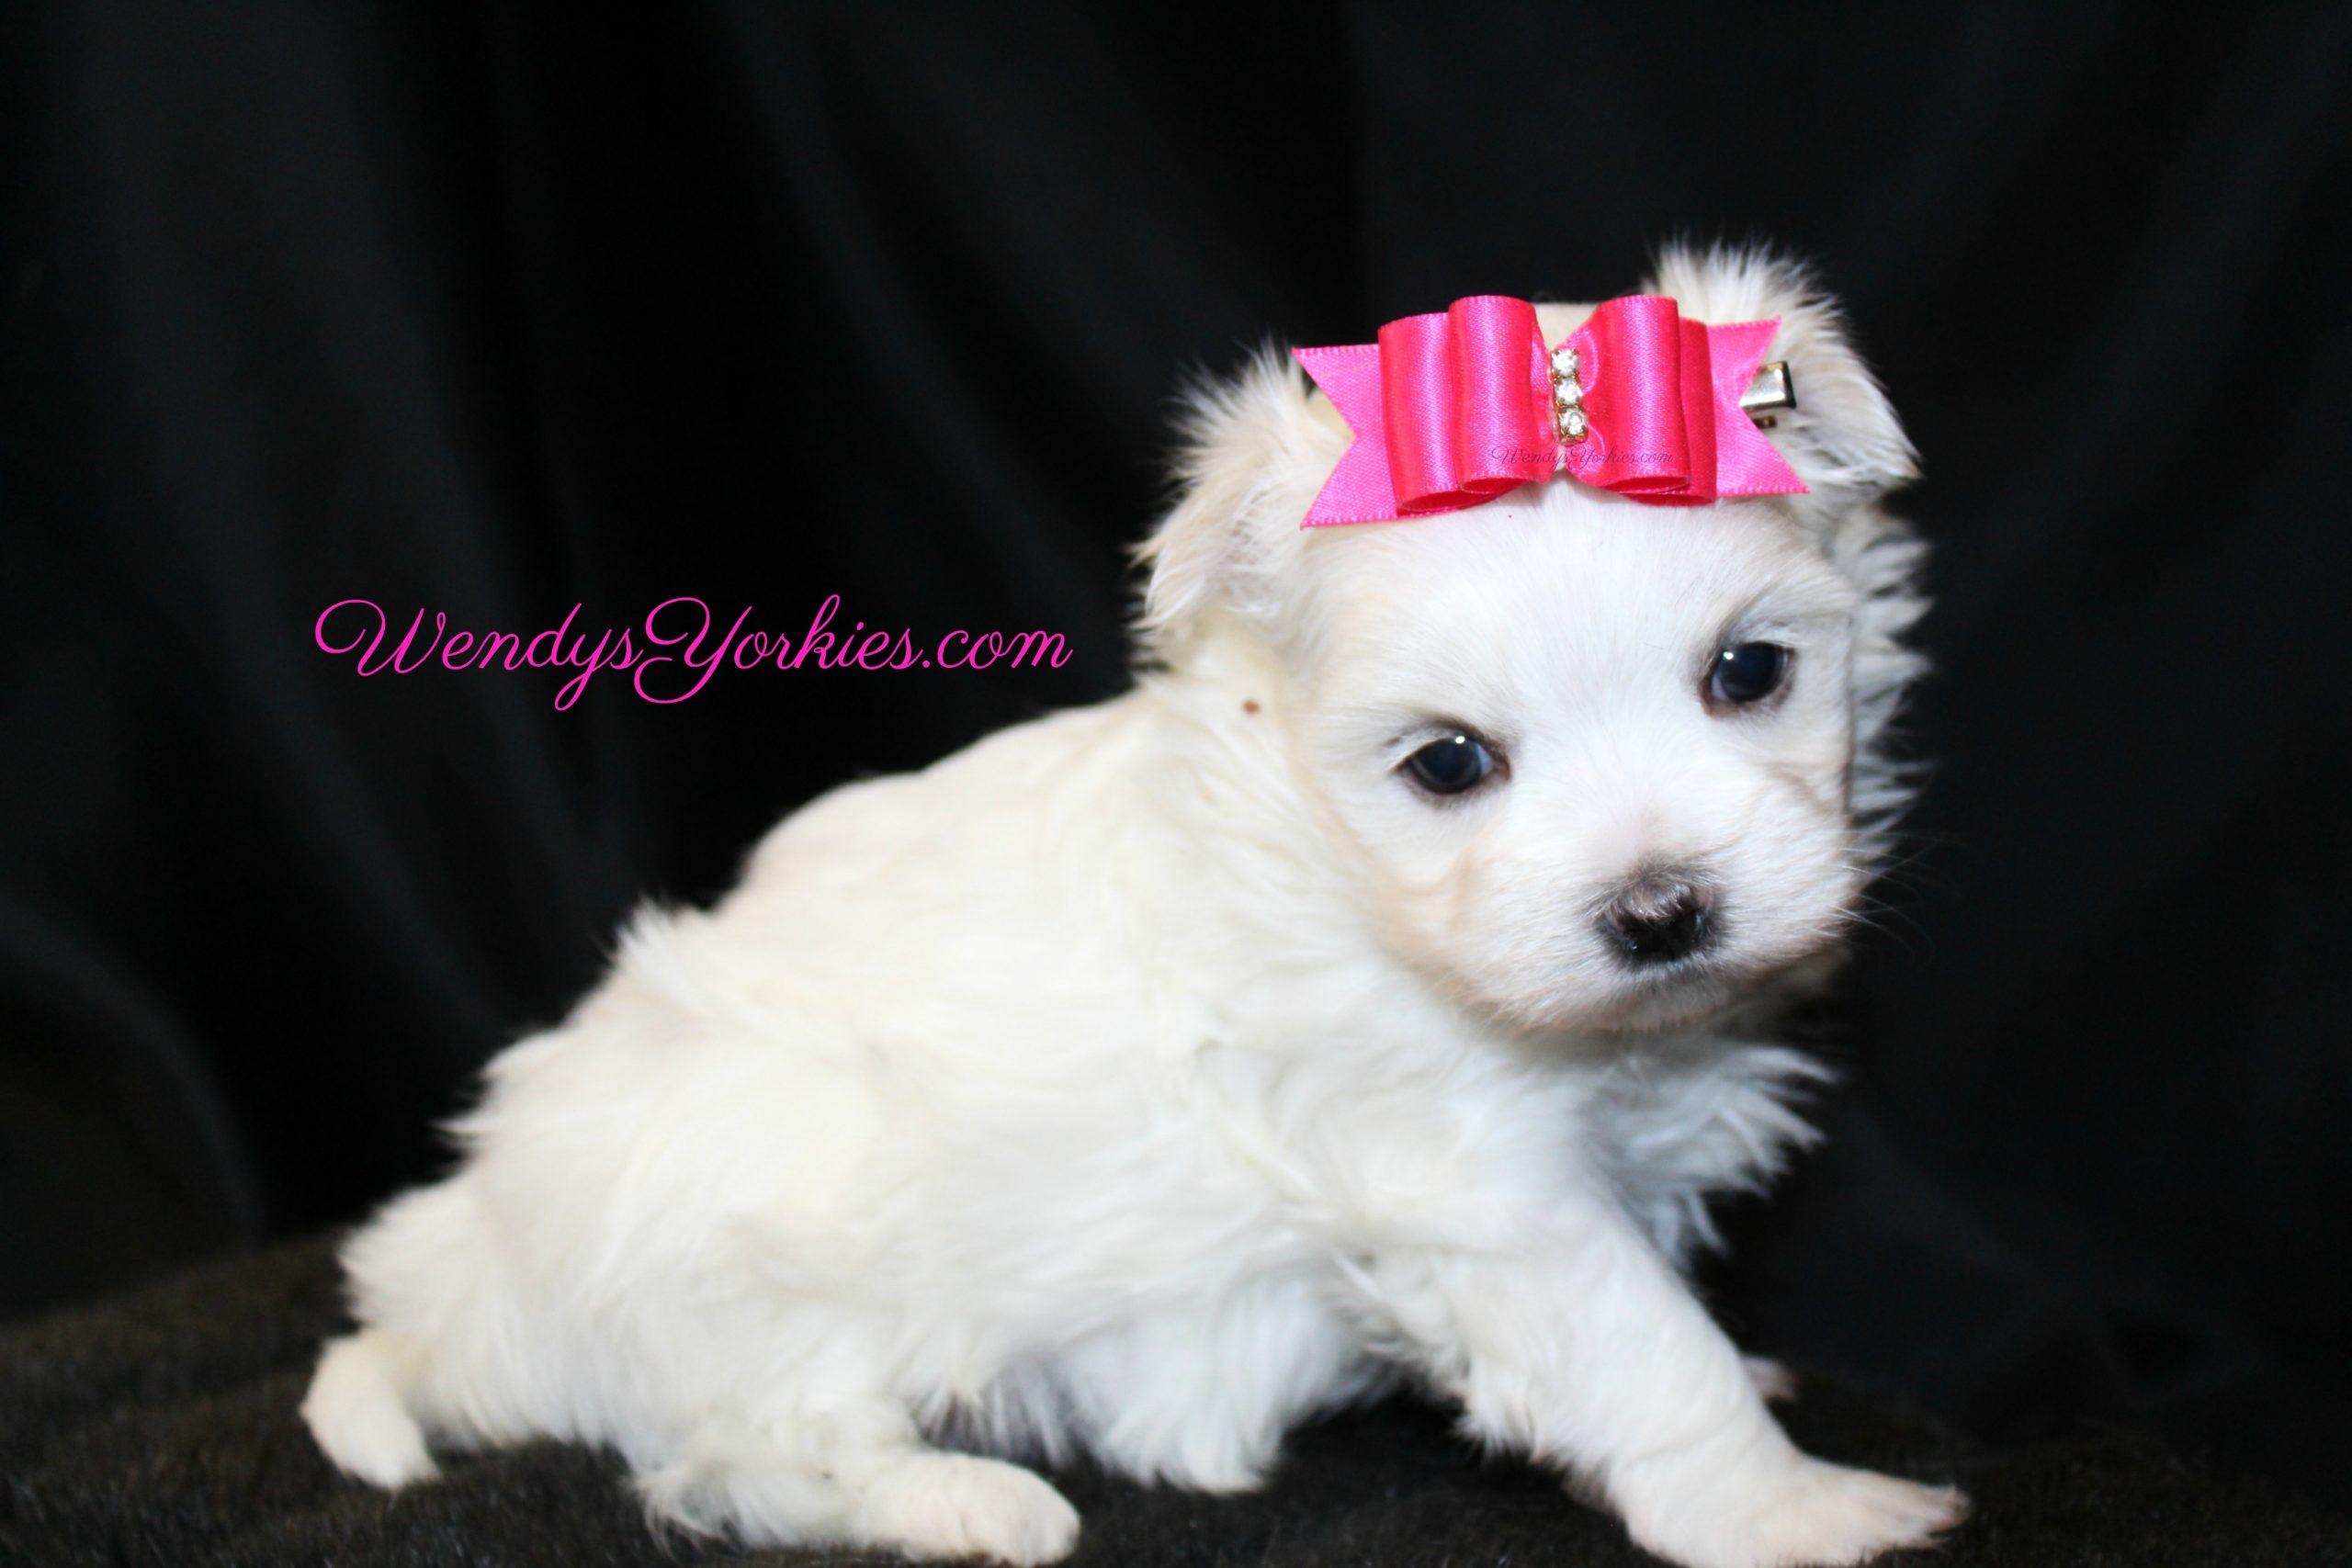 TEacup Maltese puppy for sale, Female Maltese for sale in Texas, WendysYorkies.com